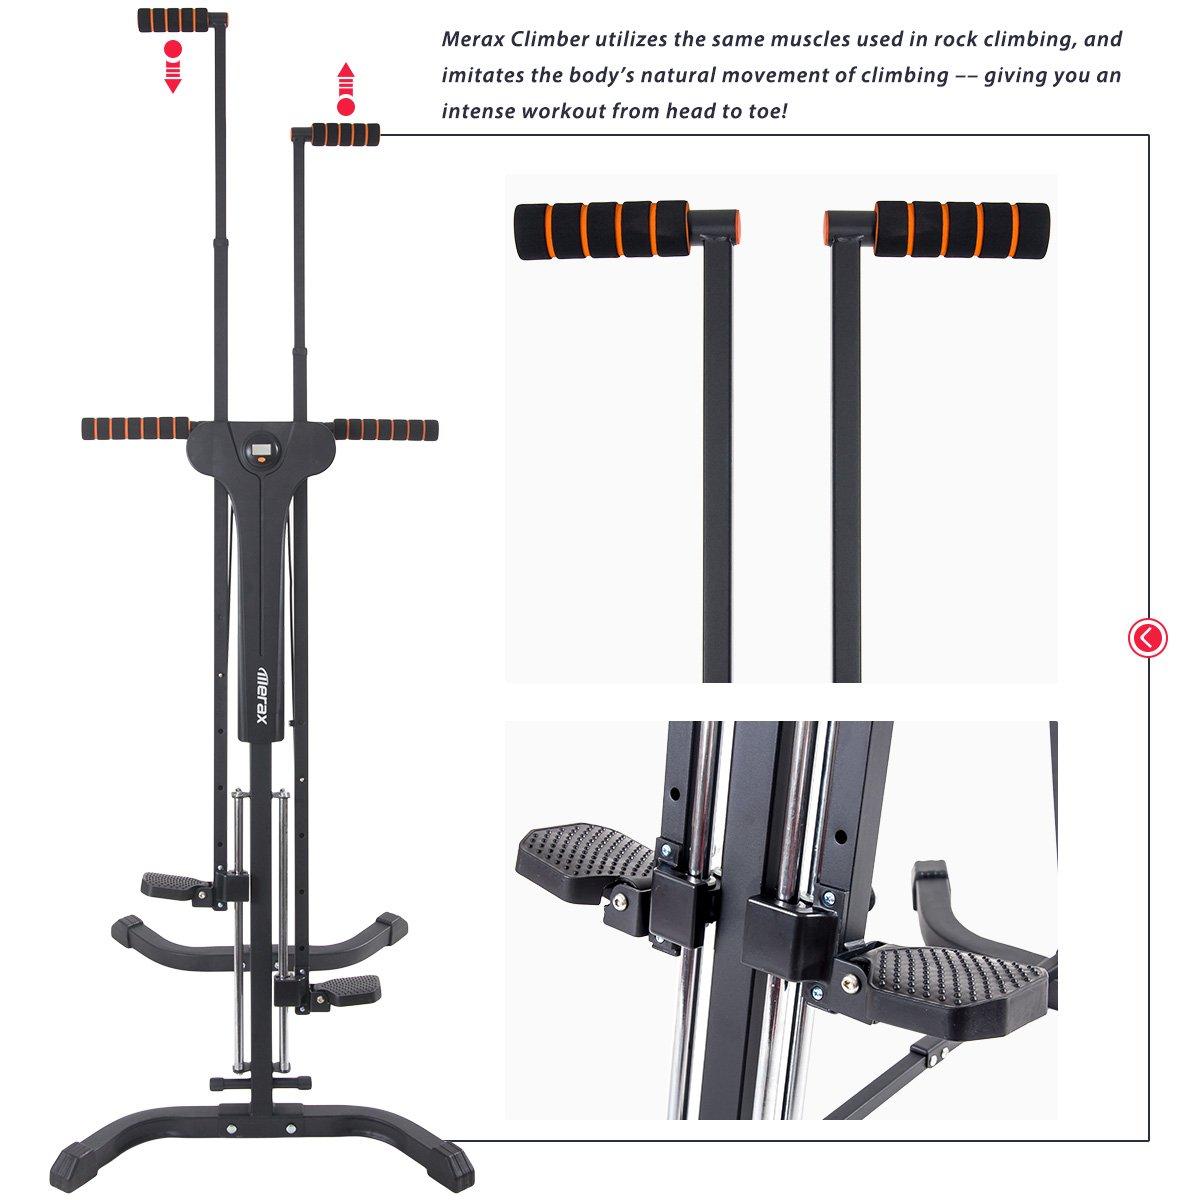 Merax Vertical Climber Fitness Climbing Cardio Machine Full Total Body Workout Fitness Folding Climber 2.0 (Black) by Merax (Image #4)